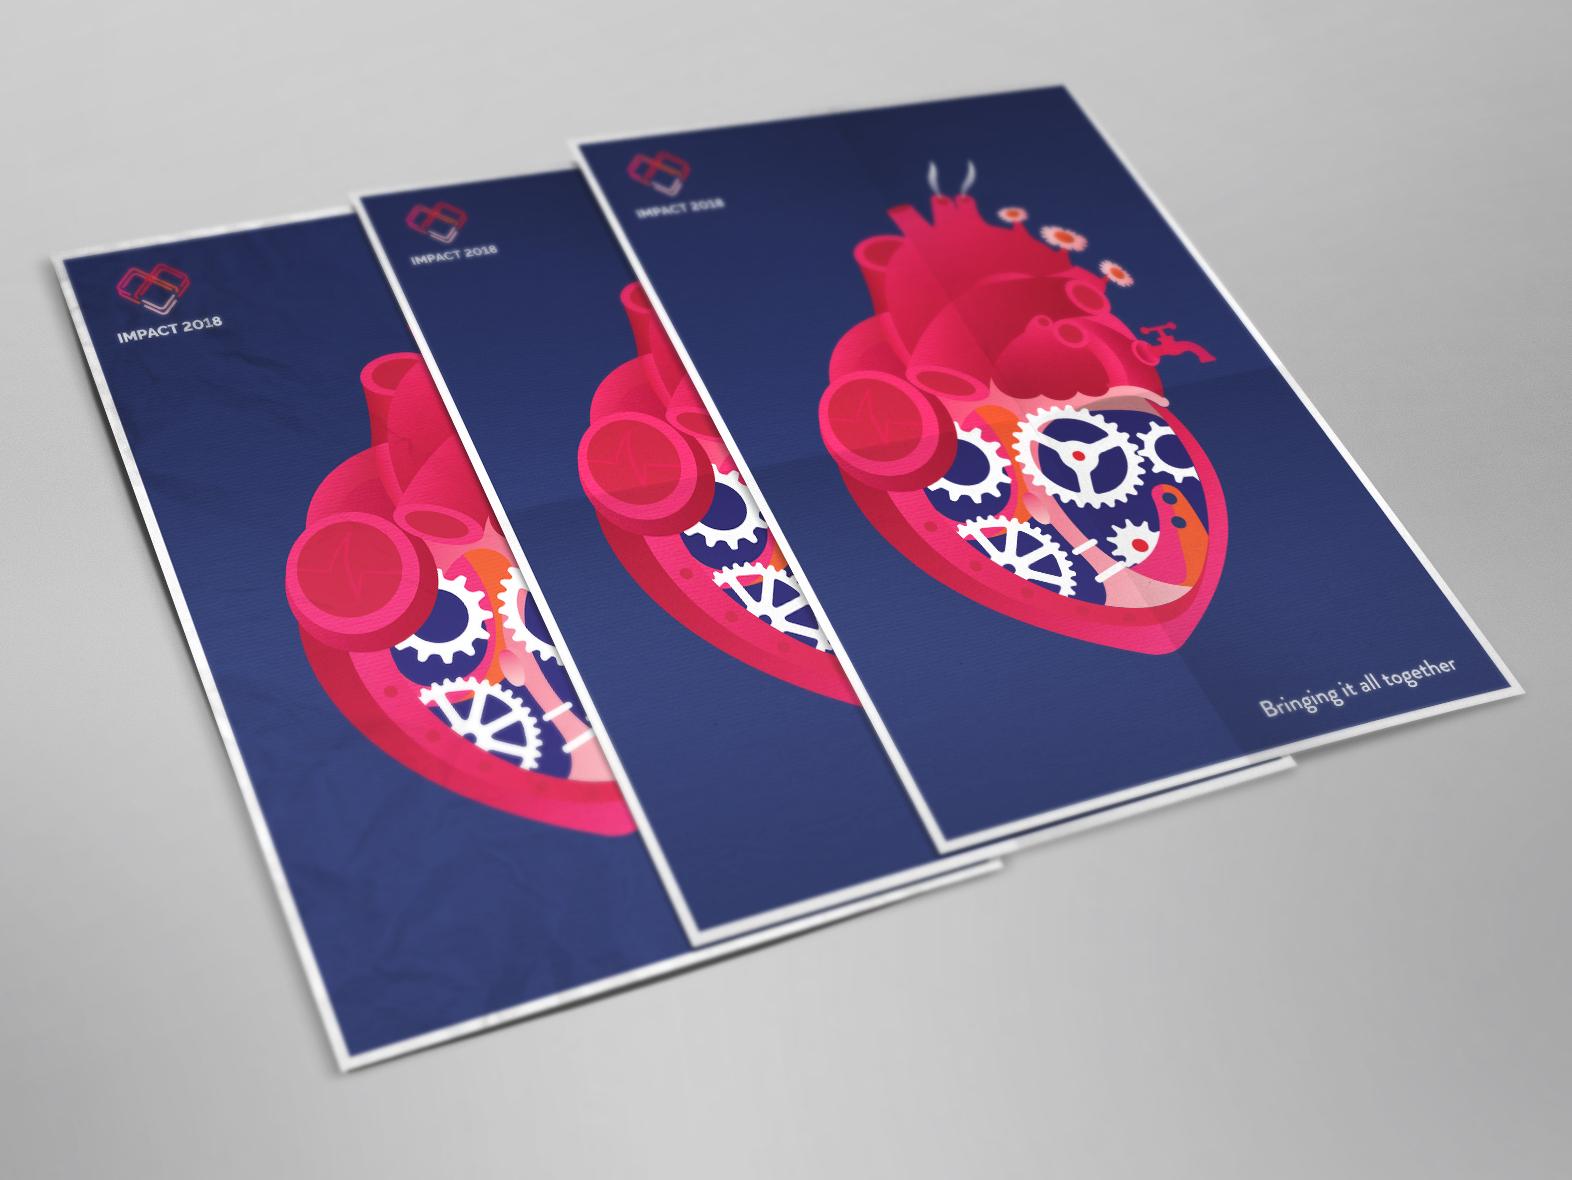 Flyer Poster Mockup 01 poster design vector flat art digital art adobe illustrator vector art graphic design editorial illustration illustration